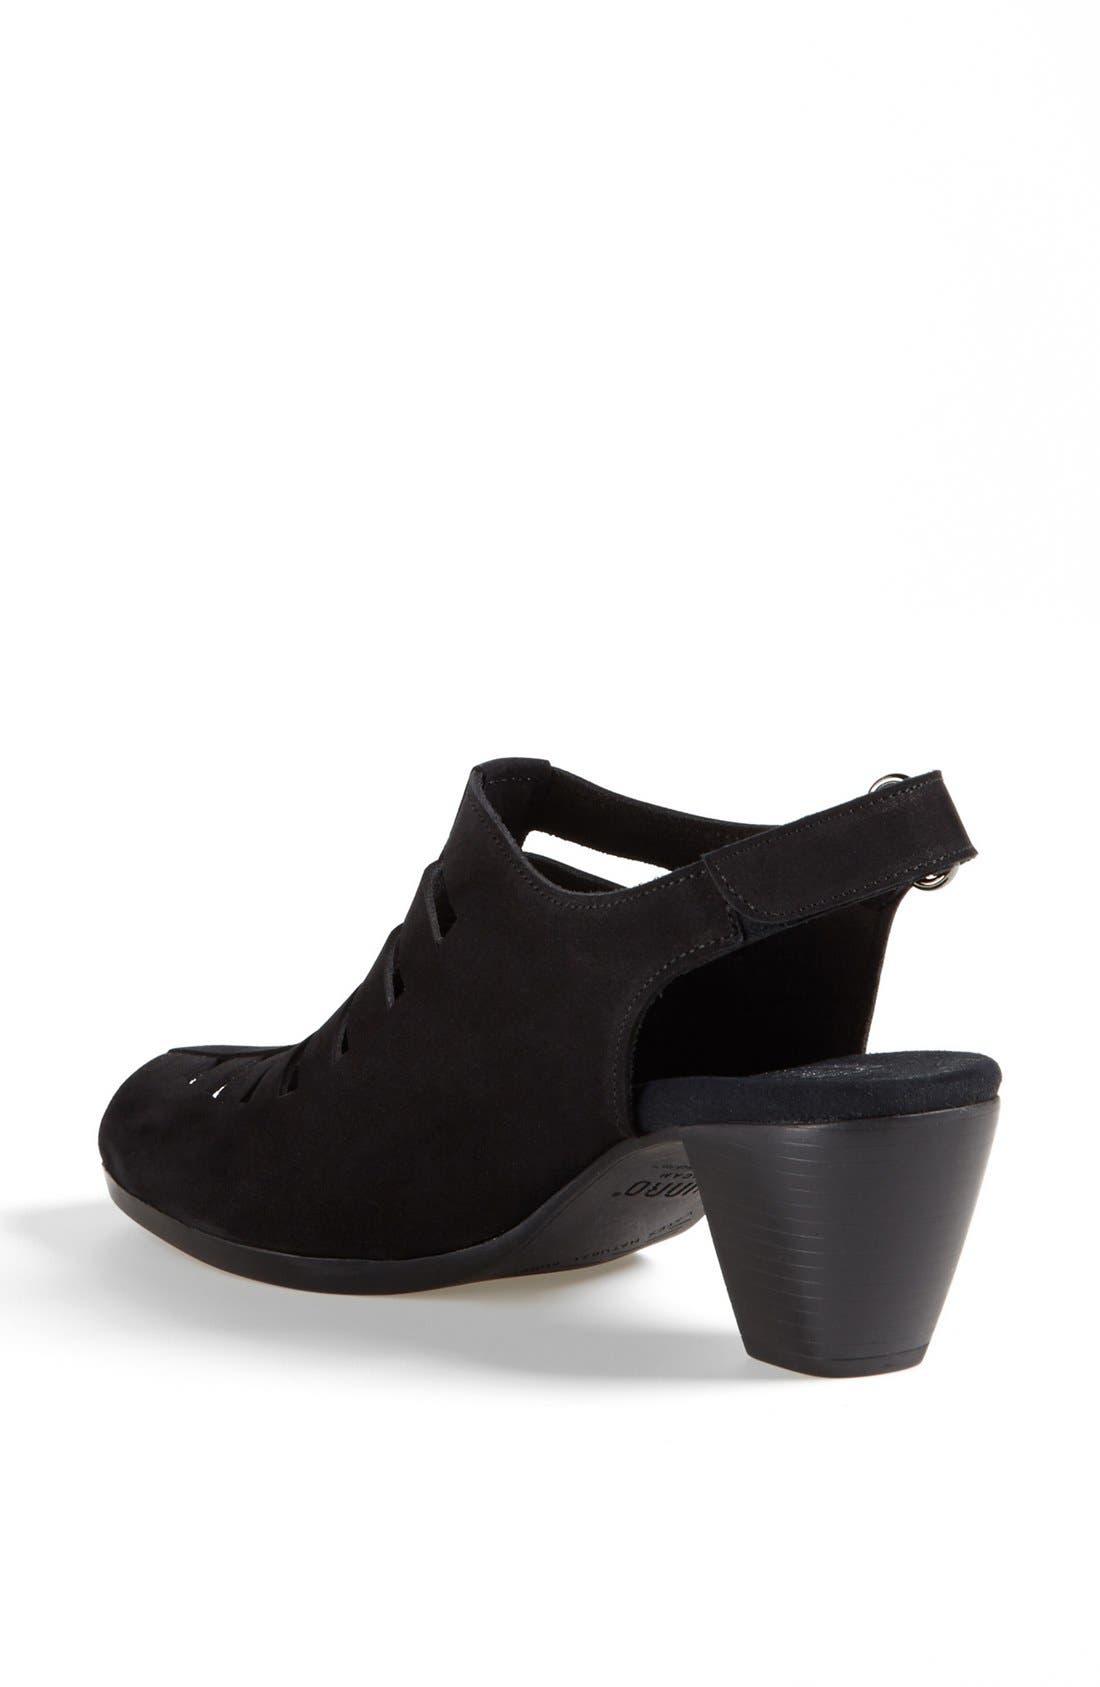 MUNRO, 'Abby' Slingback Sandal, Alternate thumbnail 2, color, BLACK NUBUCK LEATHER